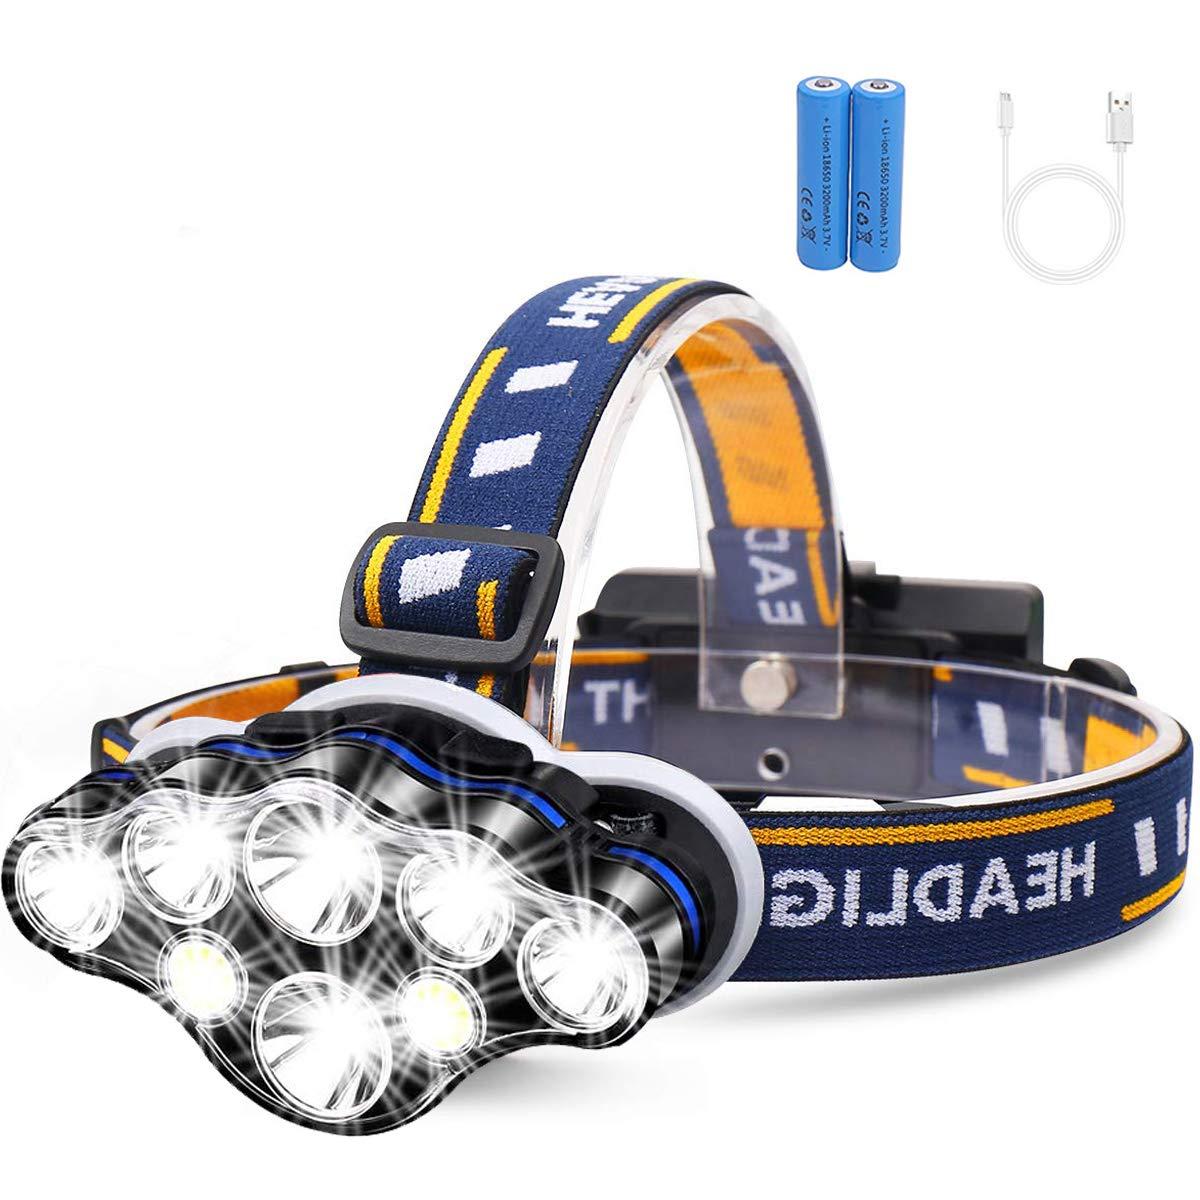 GM10201 8LED USB Rechargeable Headlamp